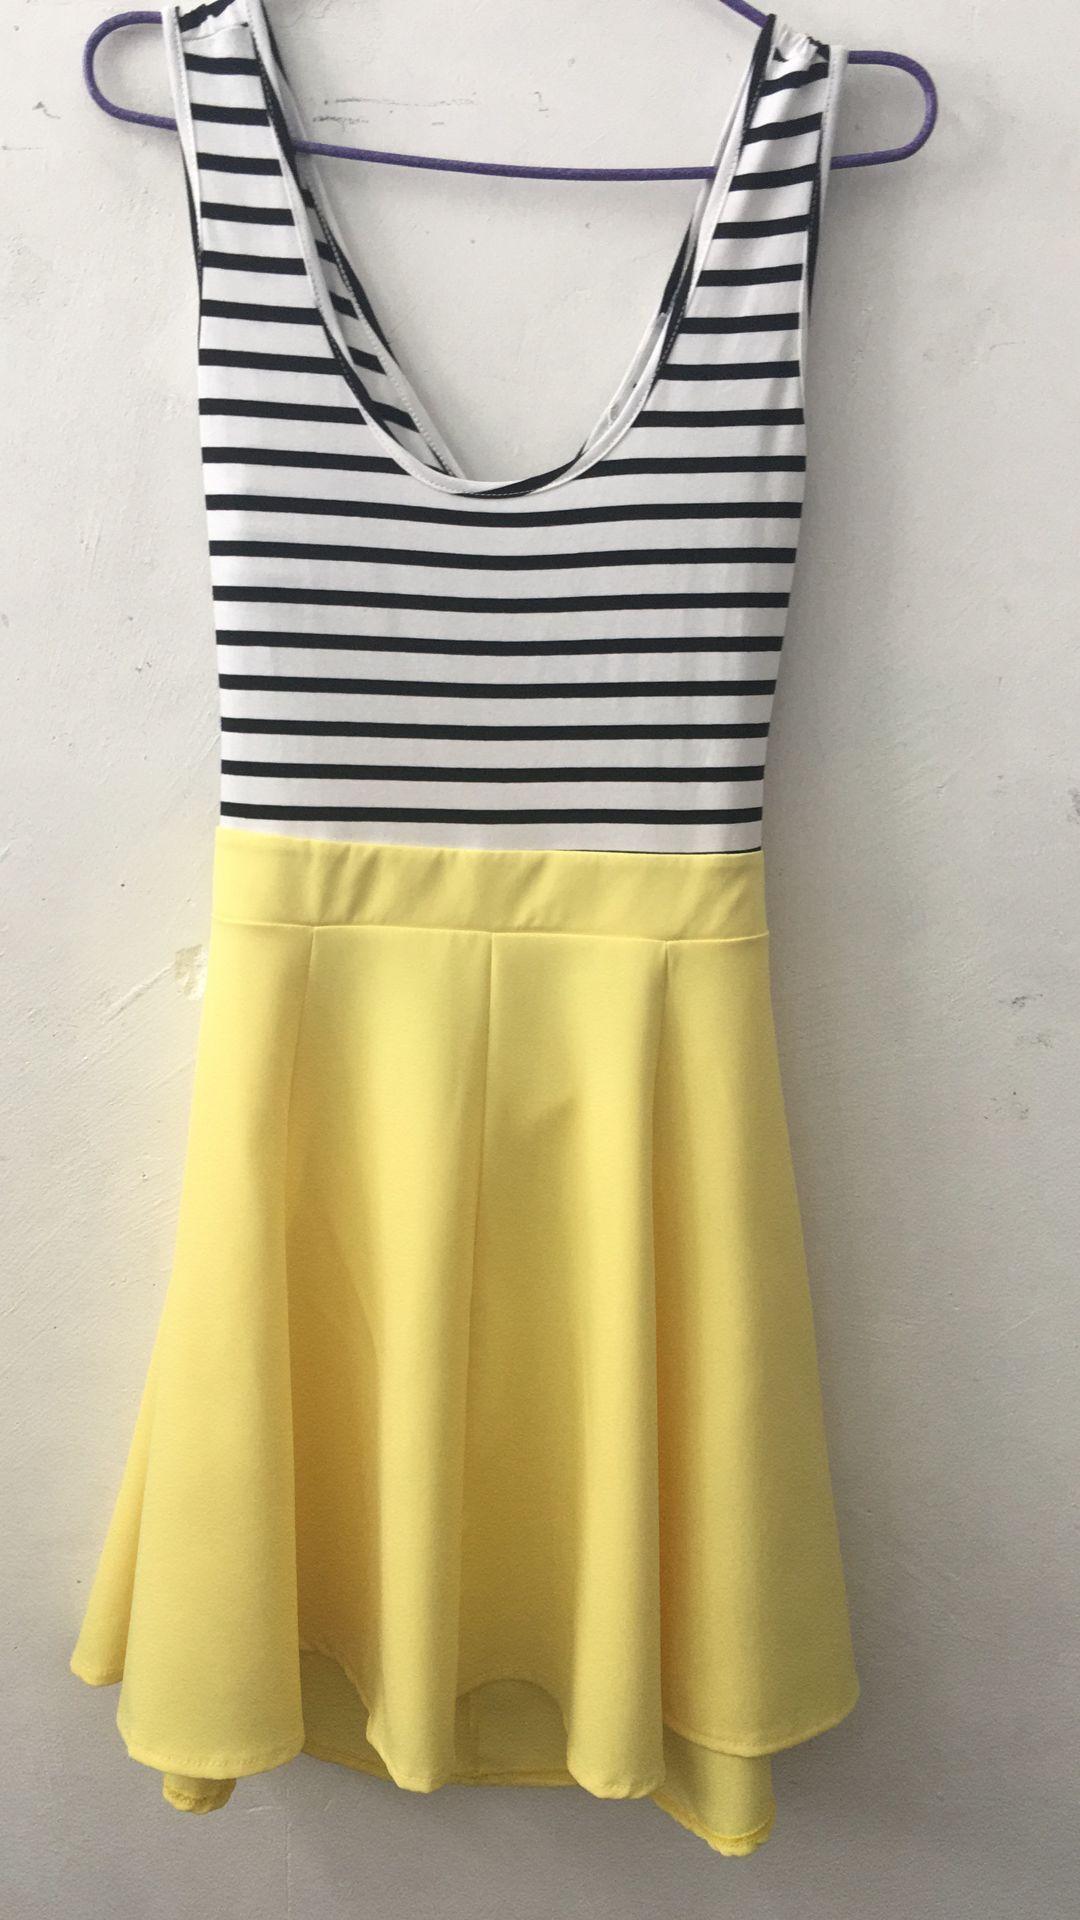 [US Direct] Ladies Open Back Sleeveless Slim Fit Striped Casual Cute Mini Dress Yellow_L